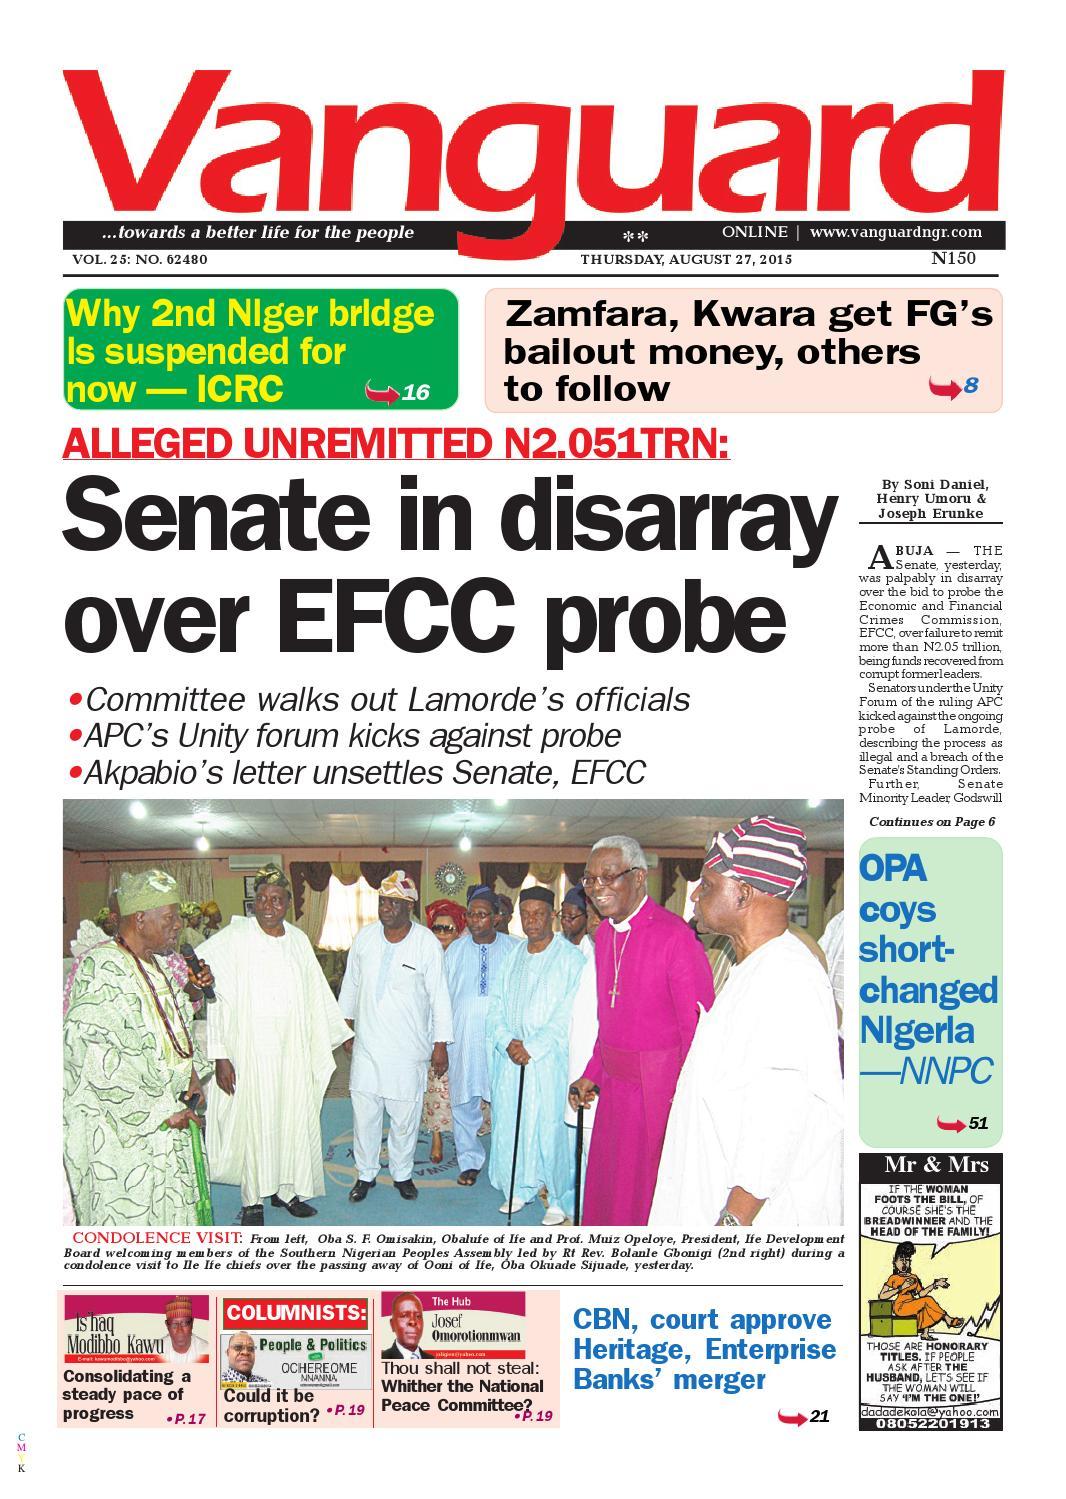 770494ef9820 Senate in disarray over EFCC probe by Vanguard Media Limited - issuu